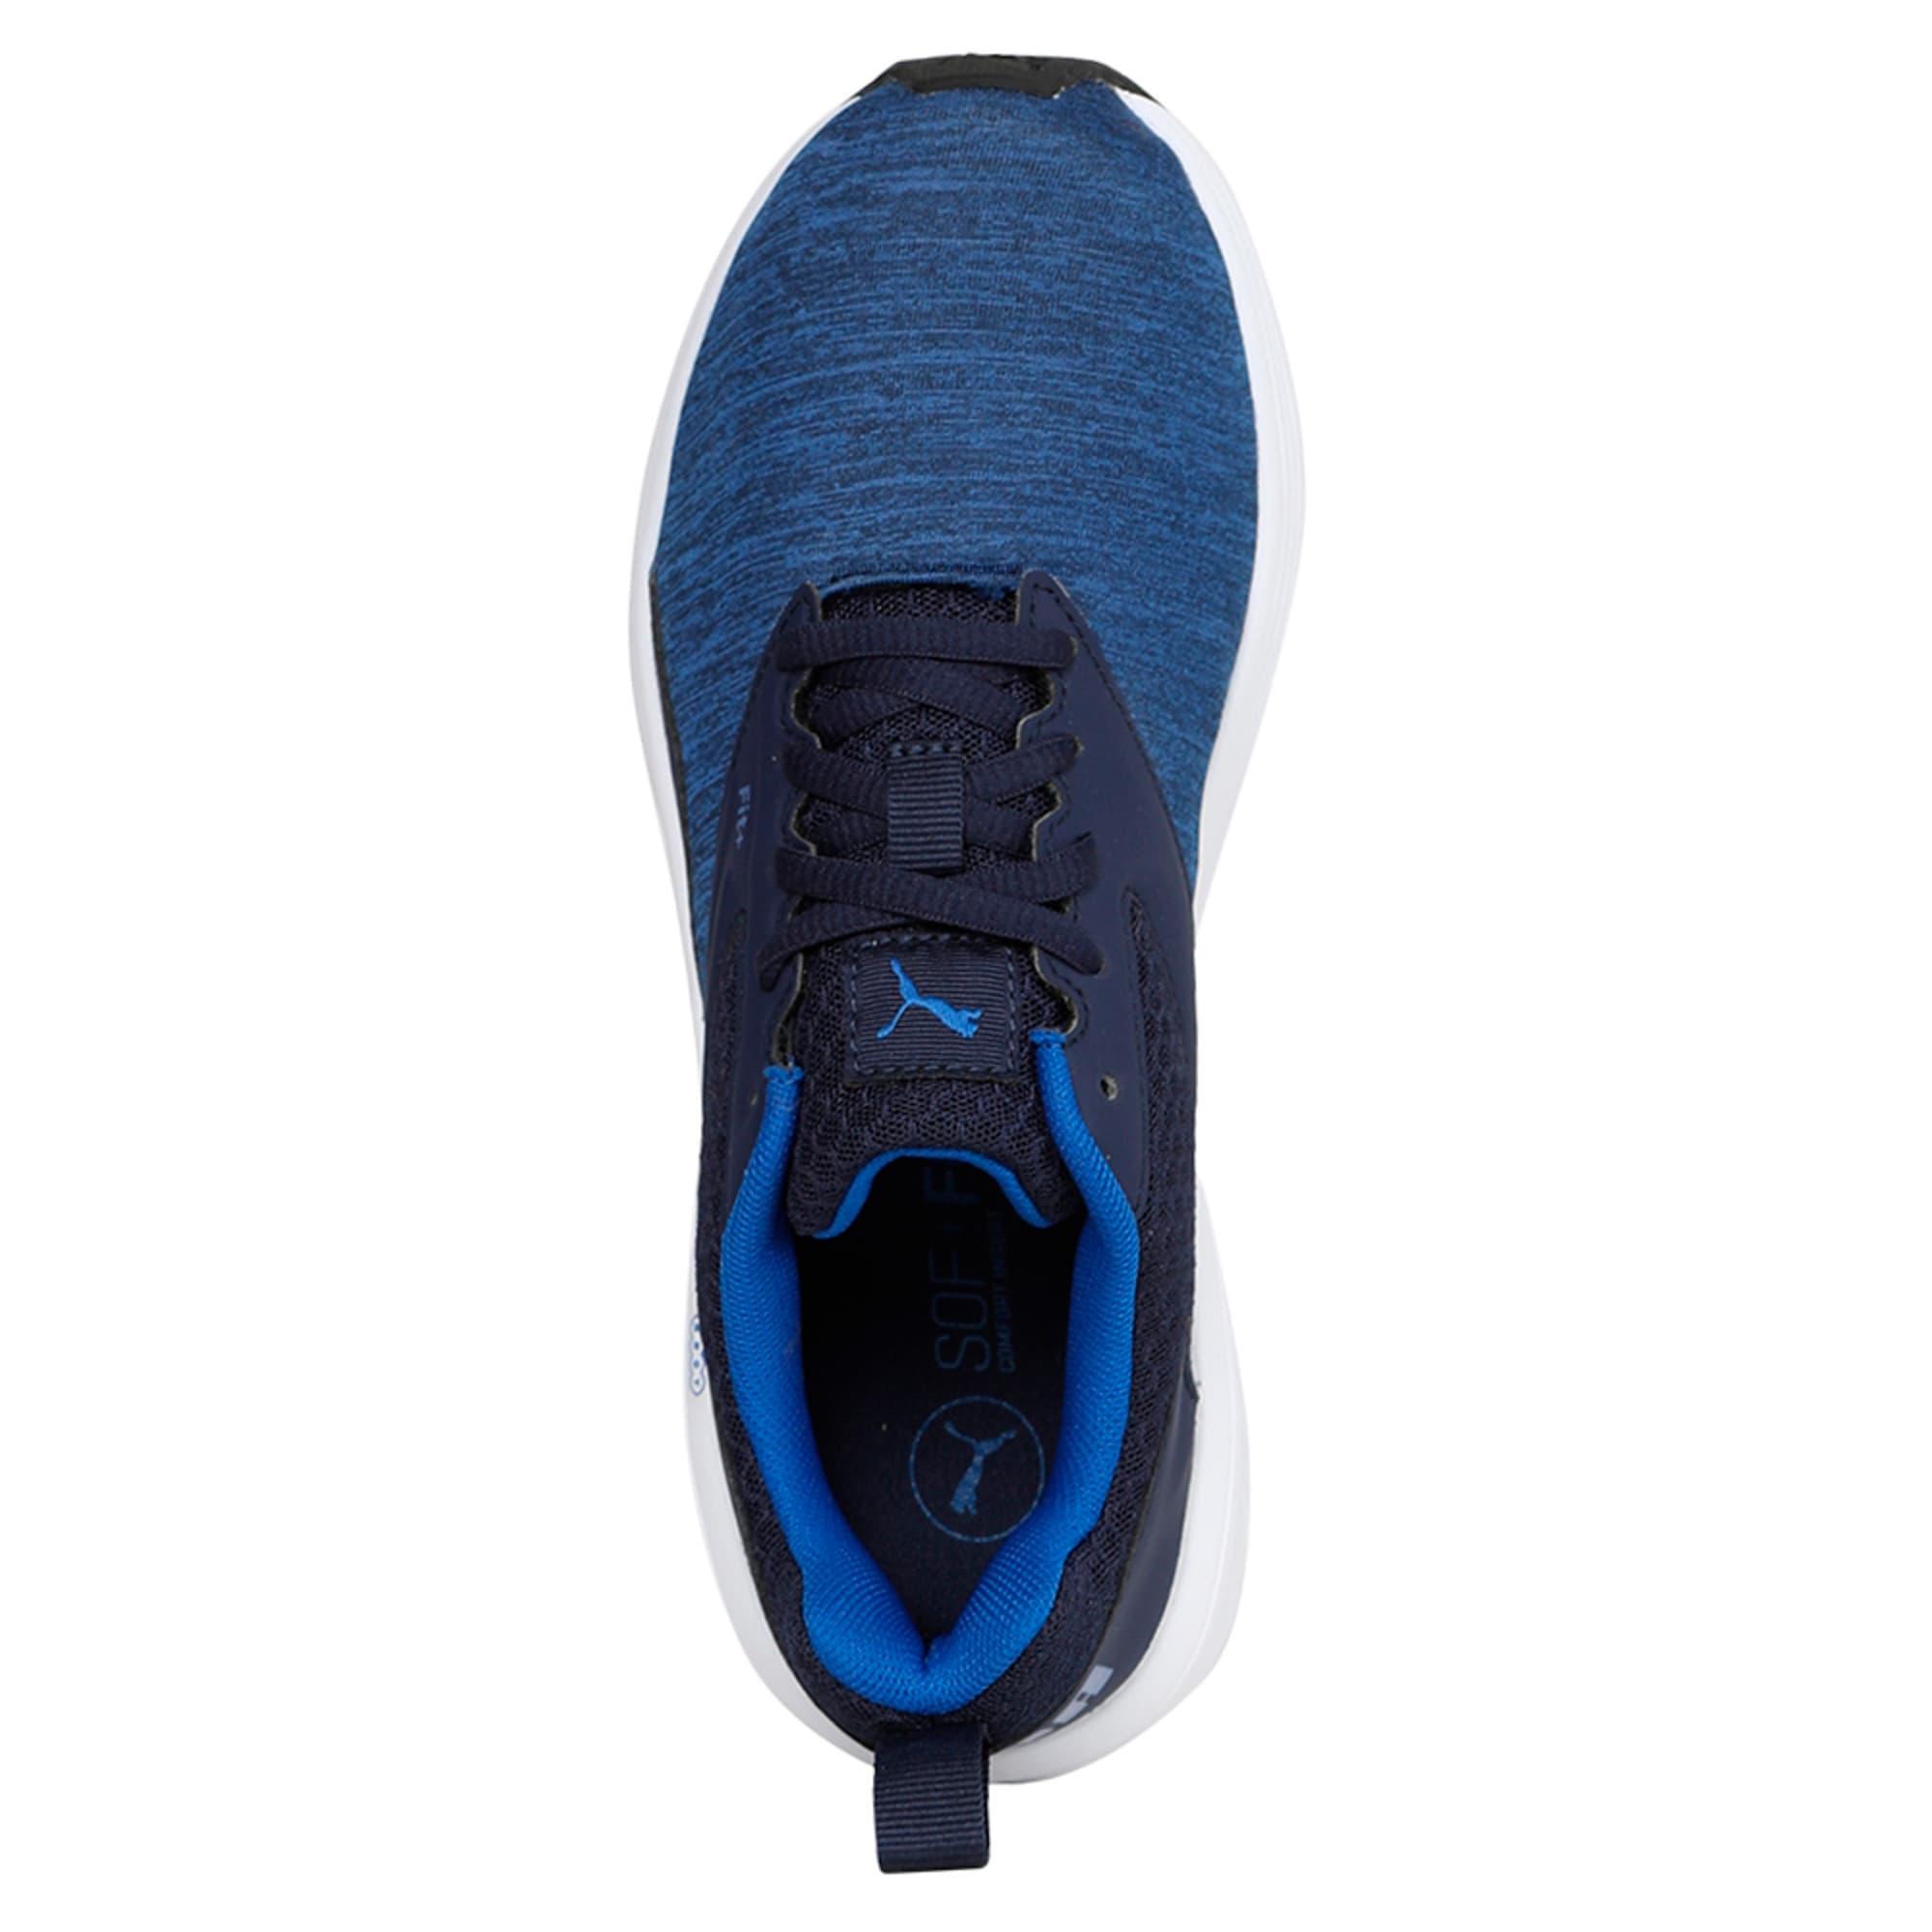 Thumbnail 3 of NRGY Comet Kids' Training Shoes, Turkish Sea-Peacoat-White, medium-IND